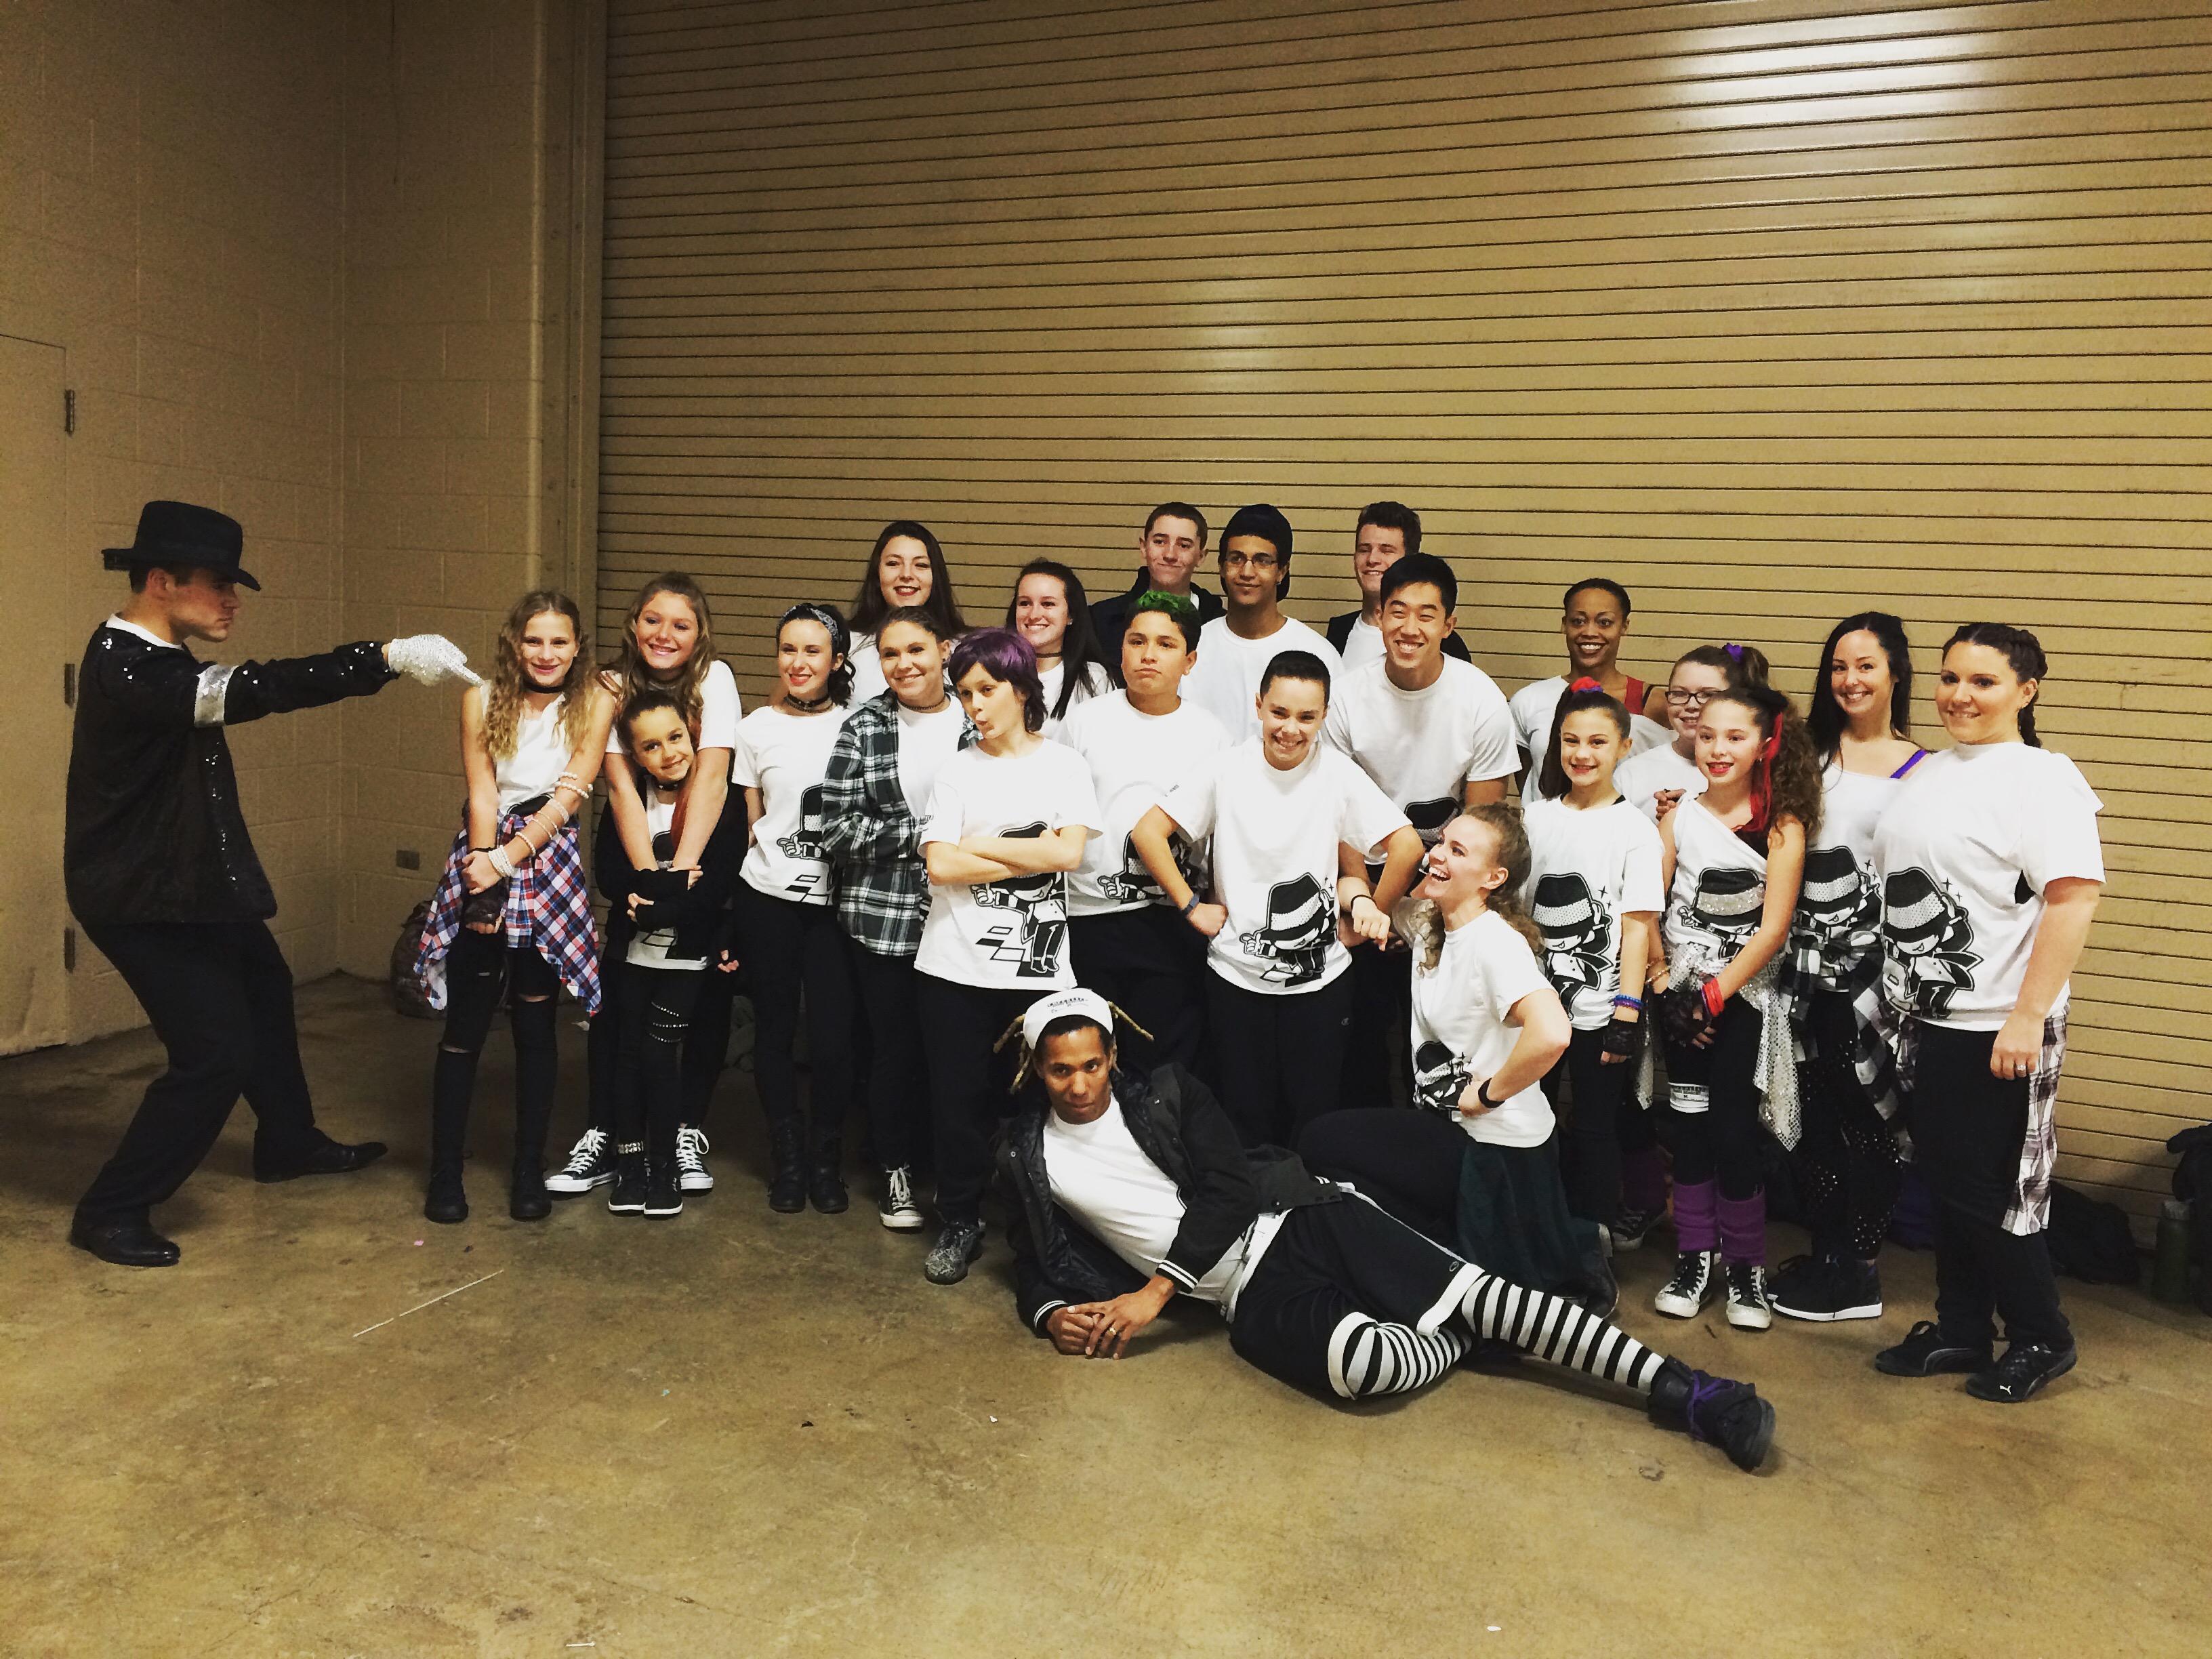 Freestyle Dance Academy Dance Group, Philadelphia 76ers, Wells Fargo Center, dance studio, dance, dance class, dance lessons, warrington, chalfont, doylestown, lansdale